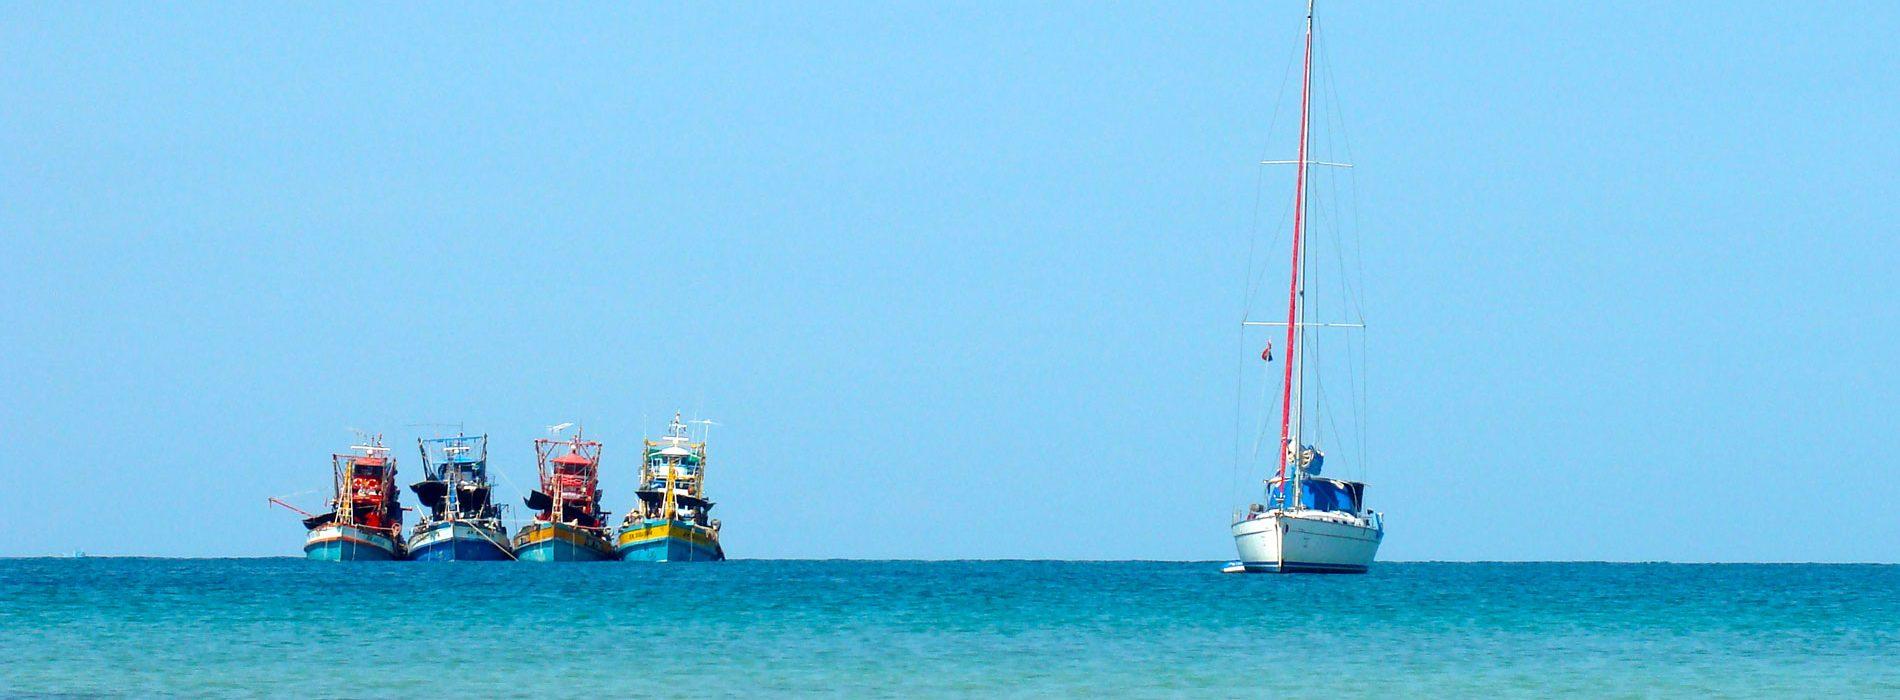 SE-Asia-Thailand-fishing-trawlers